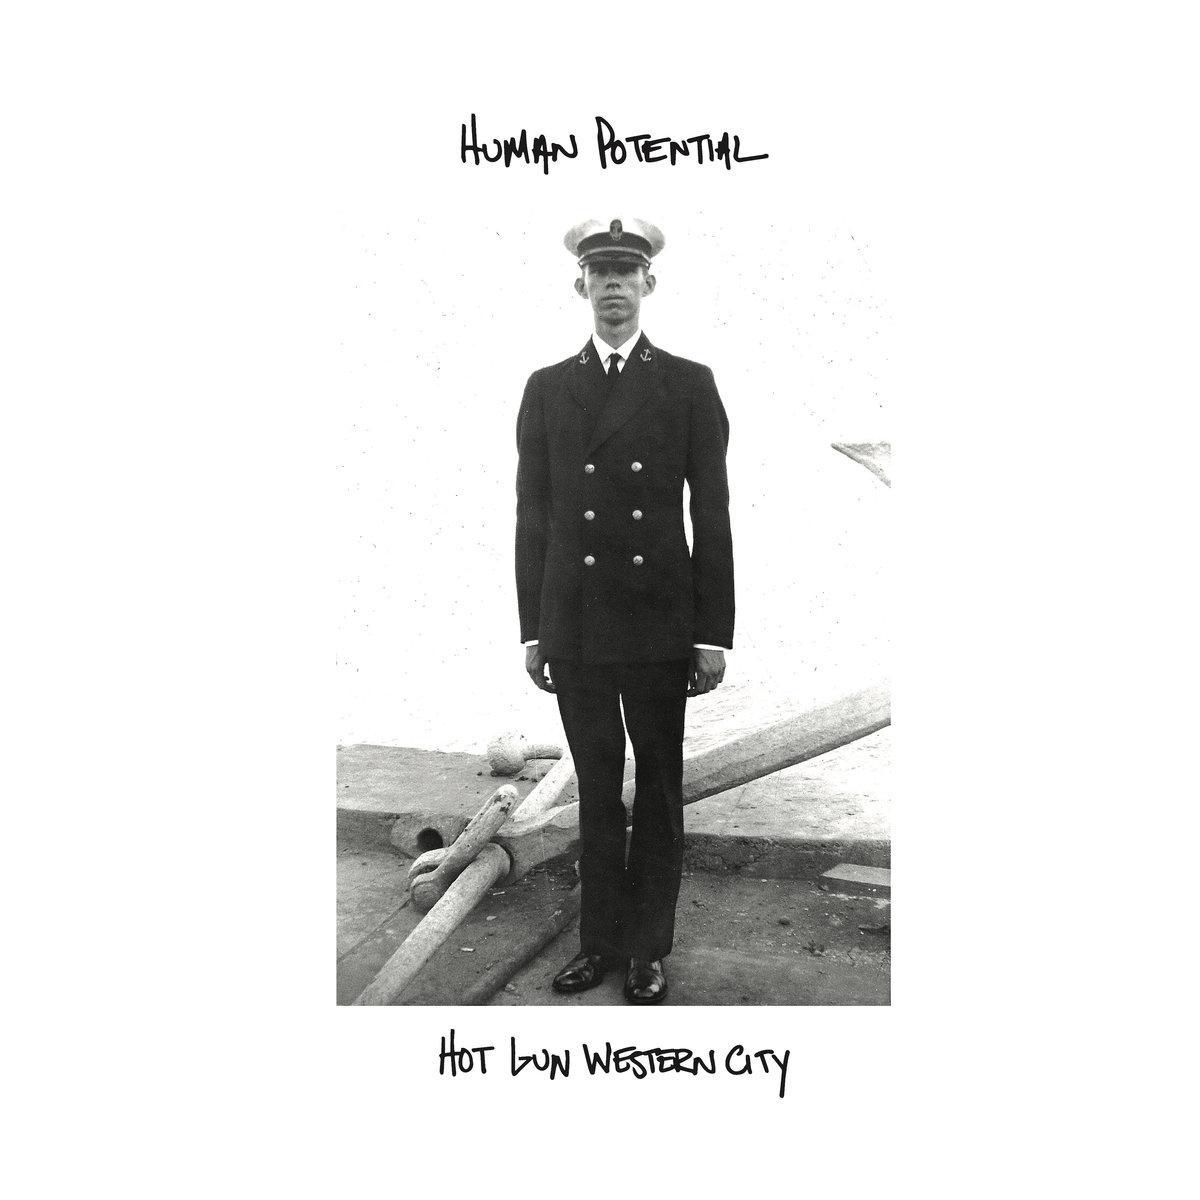 Human Potential | Hot Gun Western City album cover